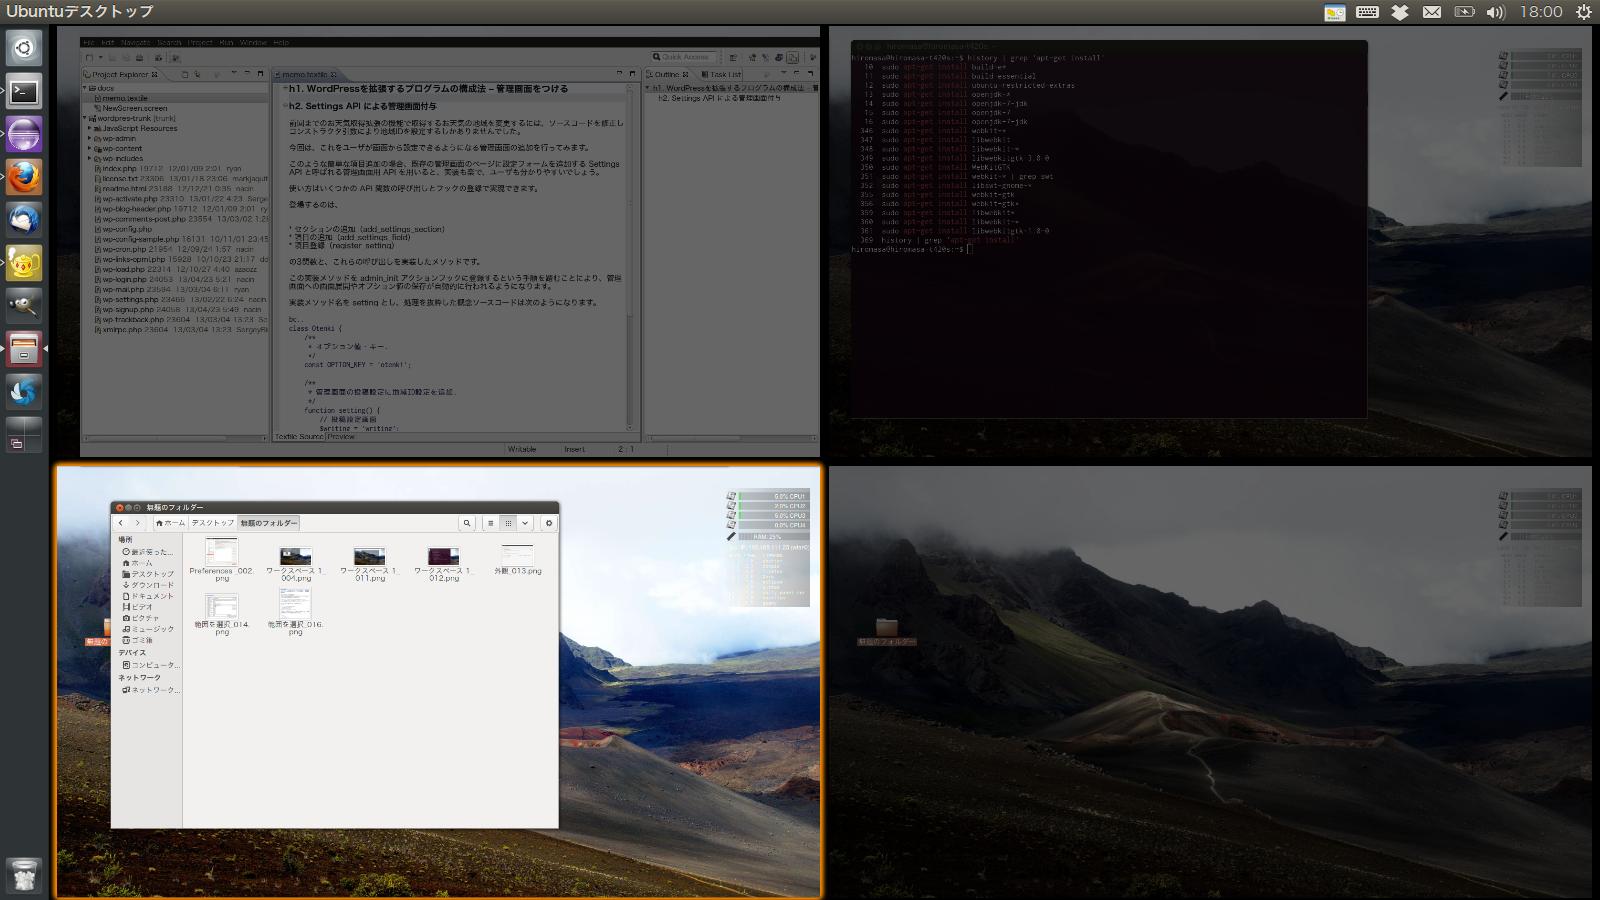 ubuntu1304-03